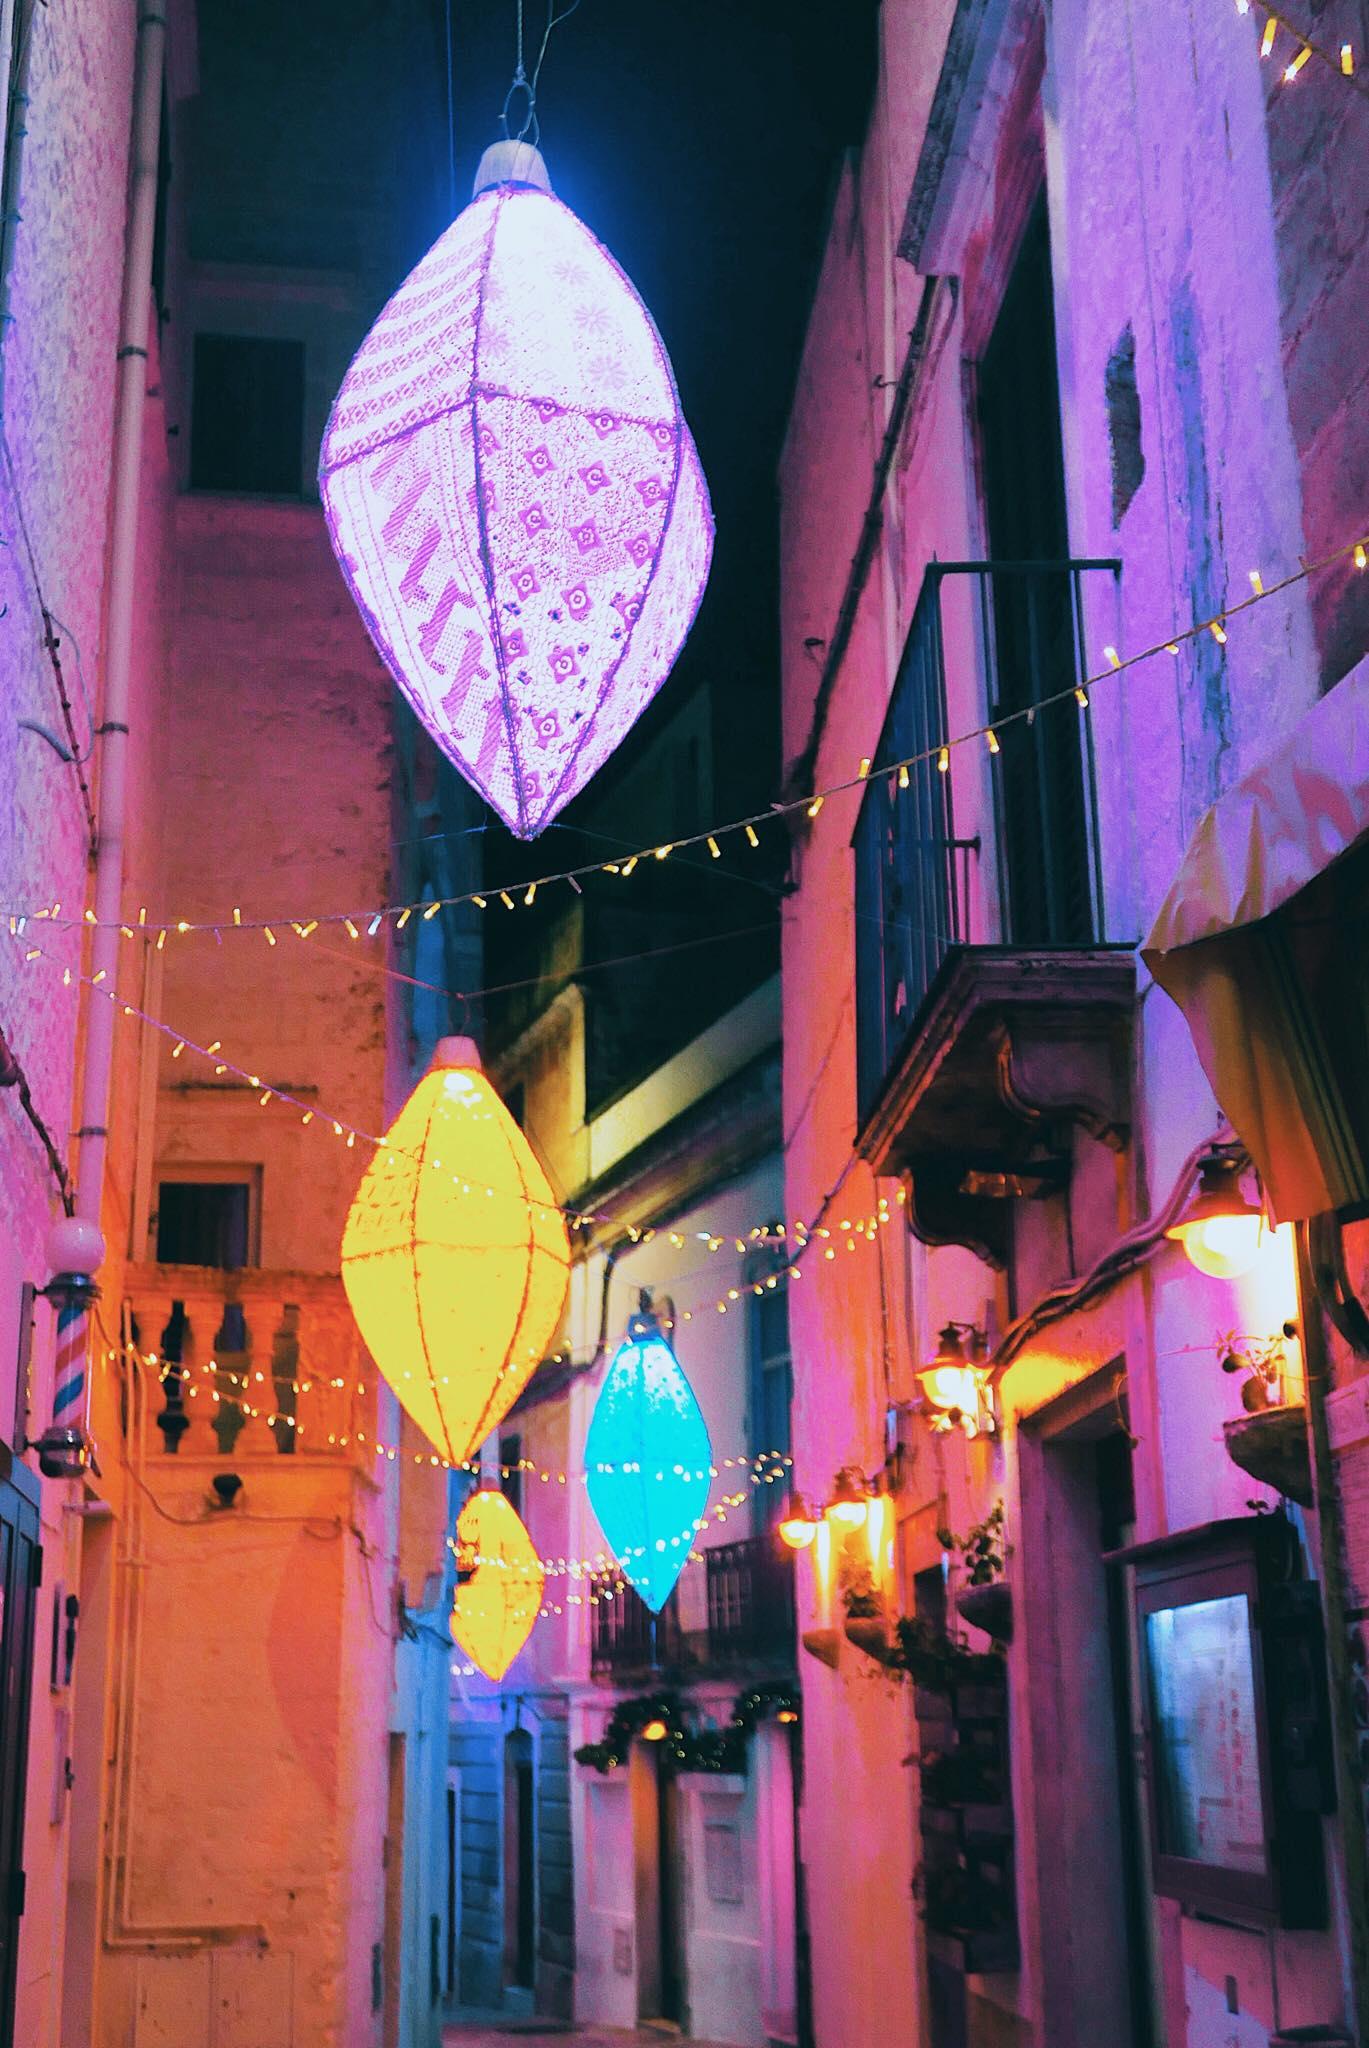 Vacanze di Natale in Valle d'Itria